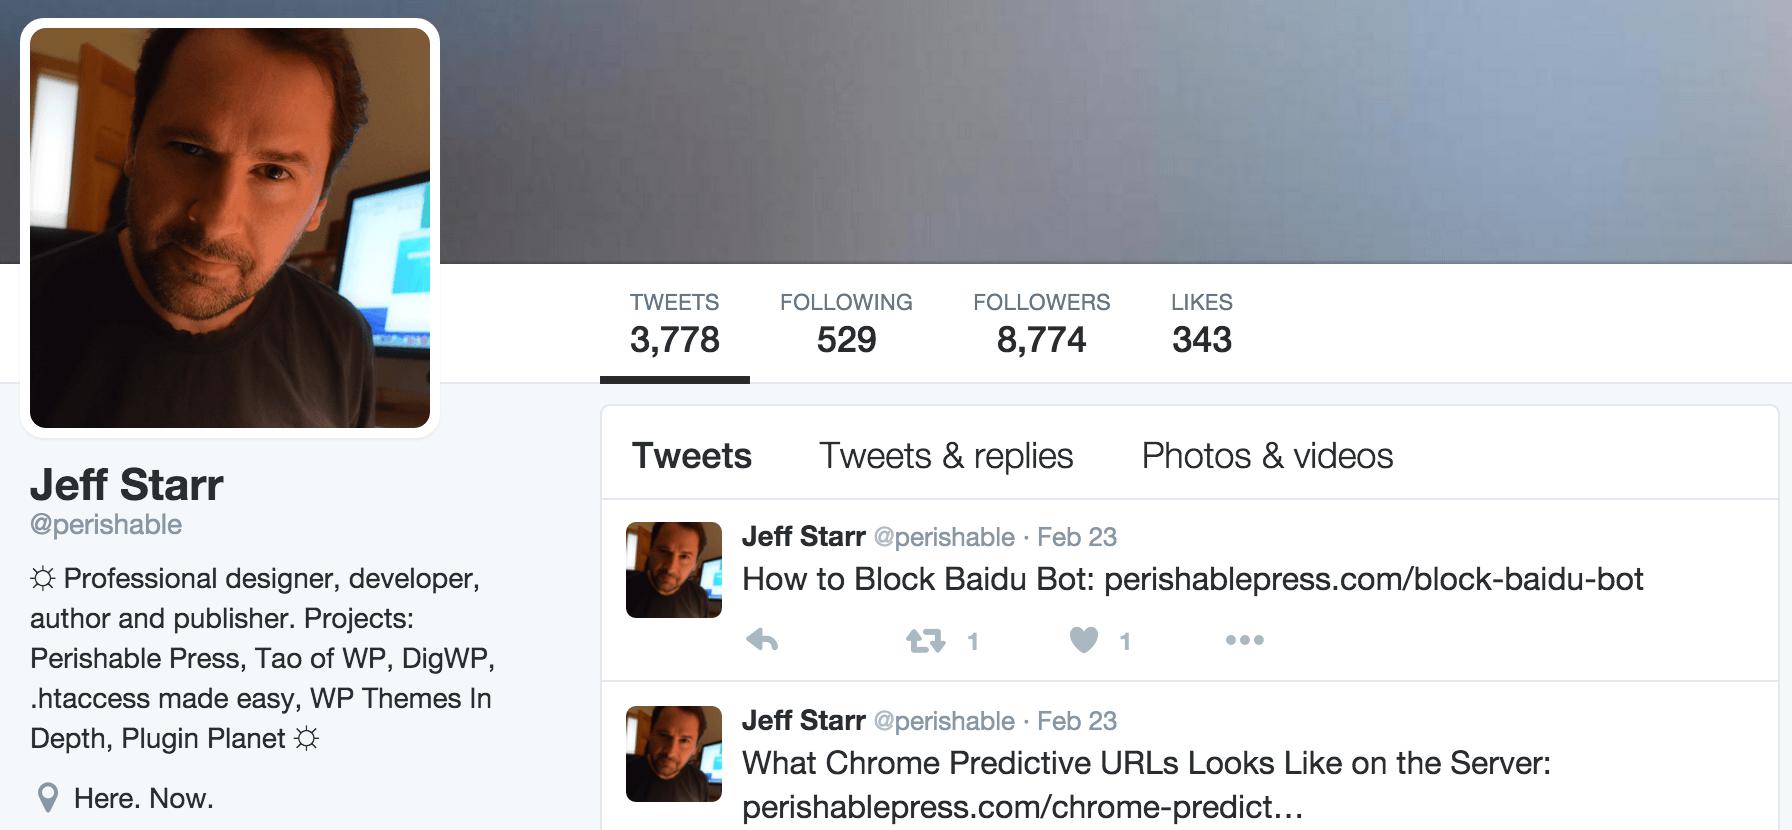 Jeff Starr